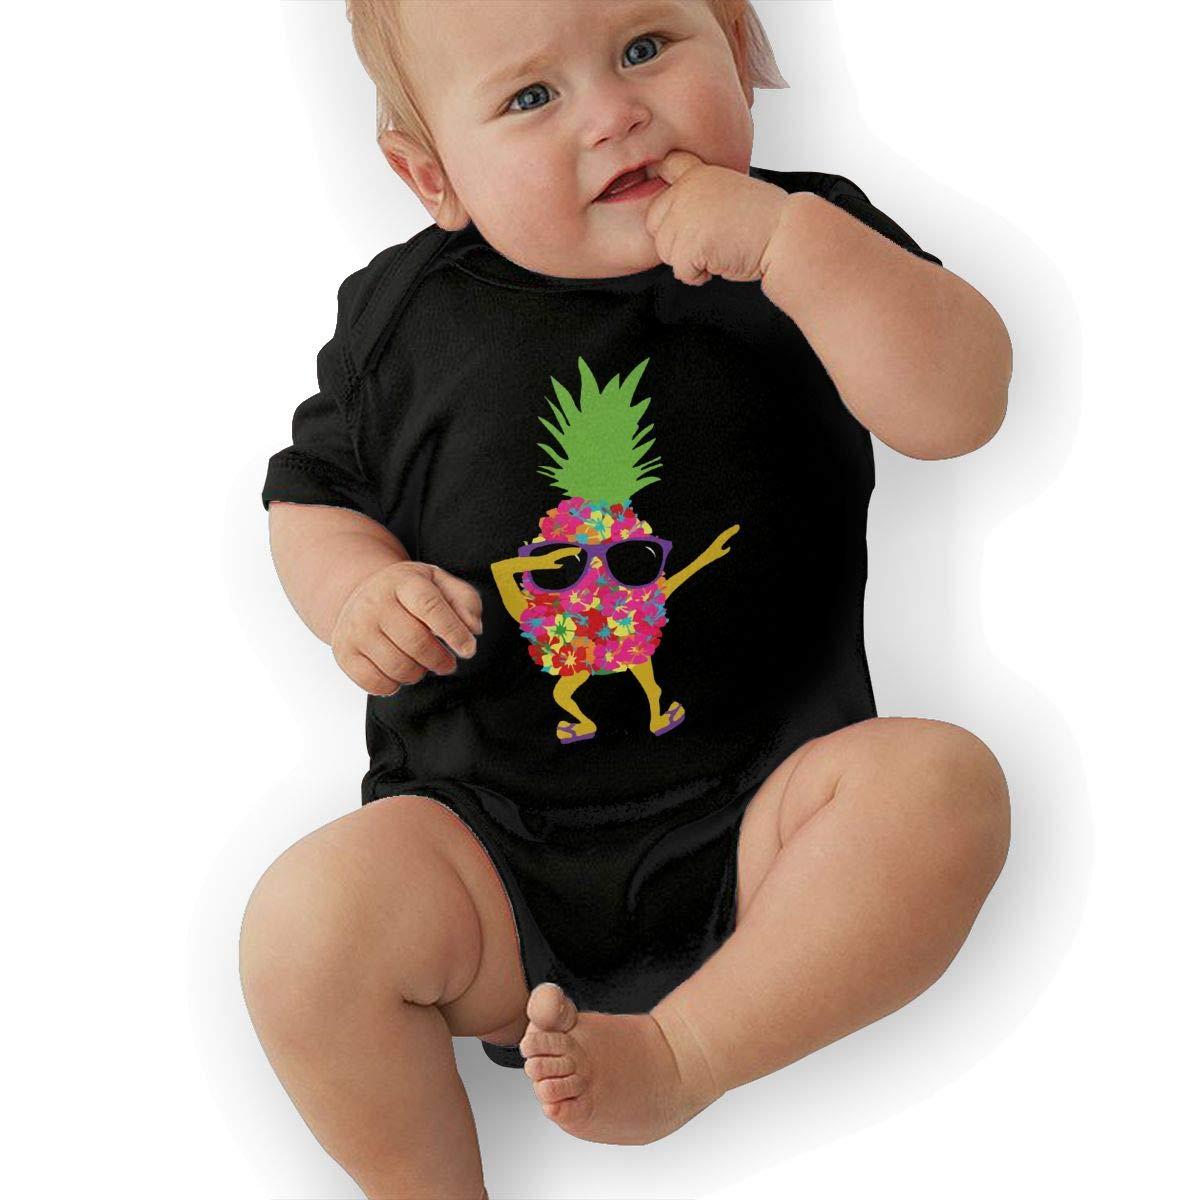 BONLOR Dabbing Cool Sunglasses Pineapple Baby Boys Girls Jumpsuit Overall Romper Bodysuit Summer Clothes Black